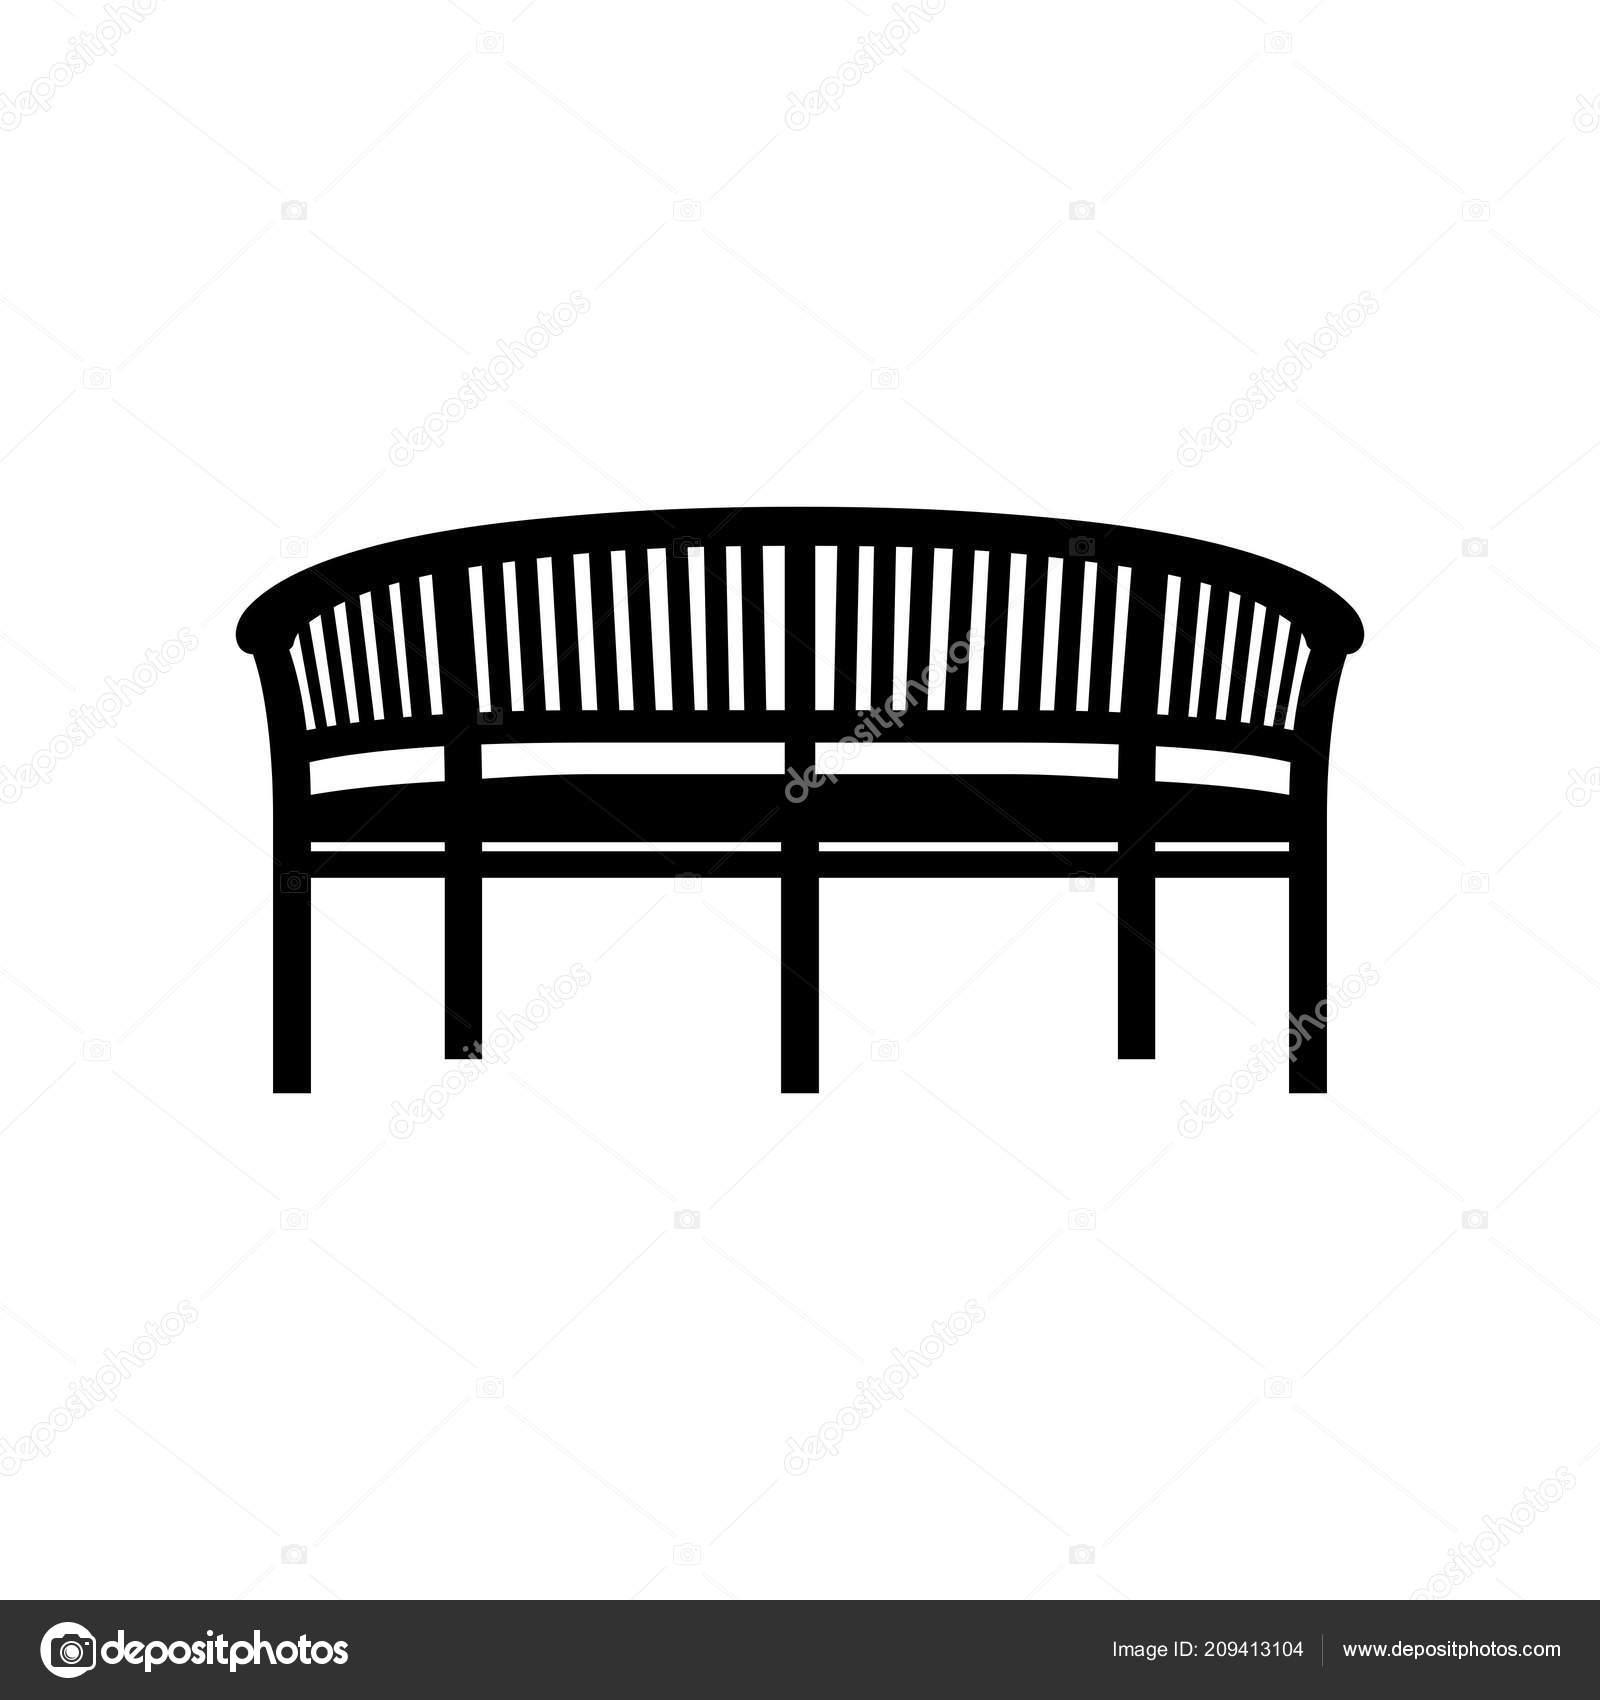 Heavy Duty Counter Stools, Garden Bench Icon Shade Picture Stock Vector C Den Barbulat 209413104